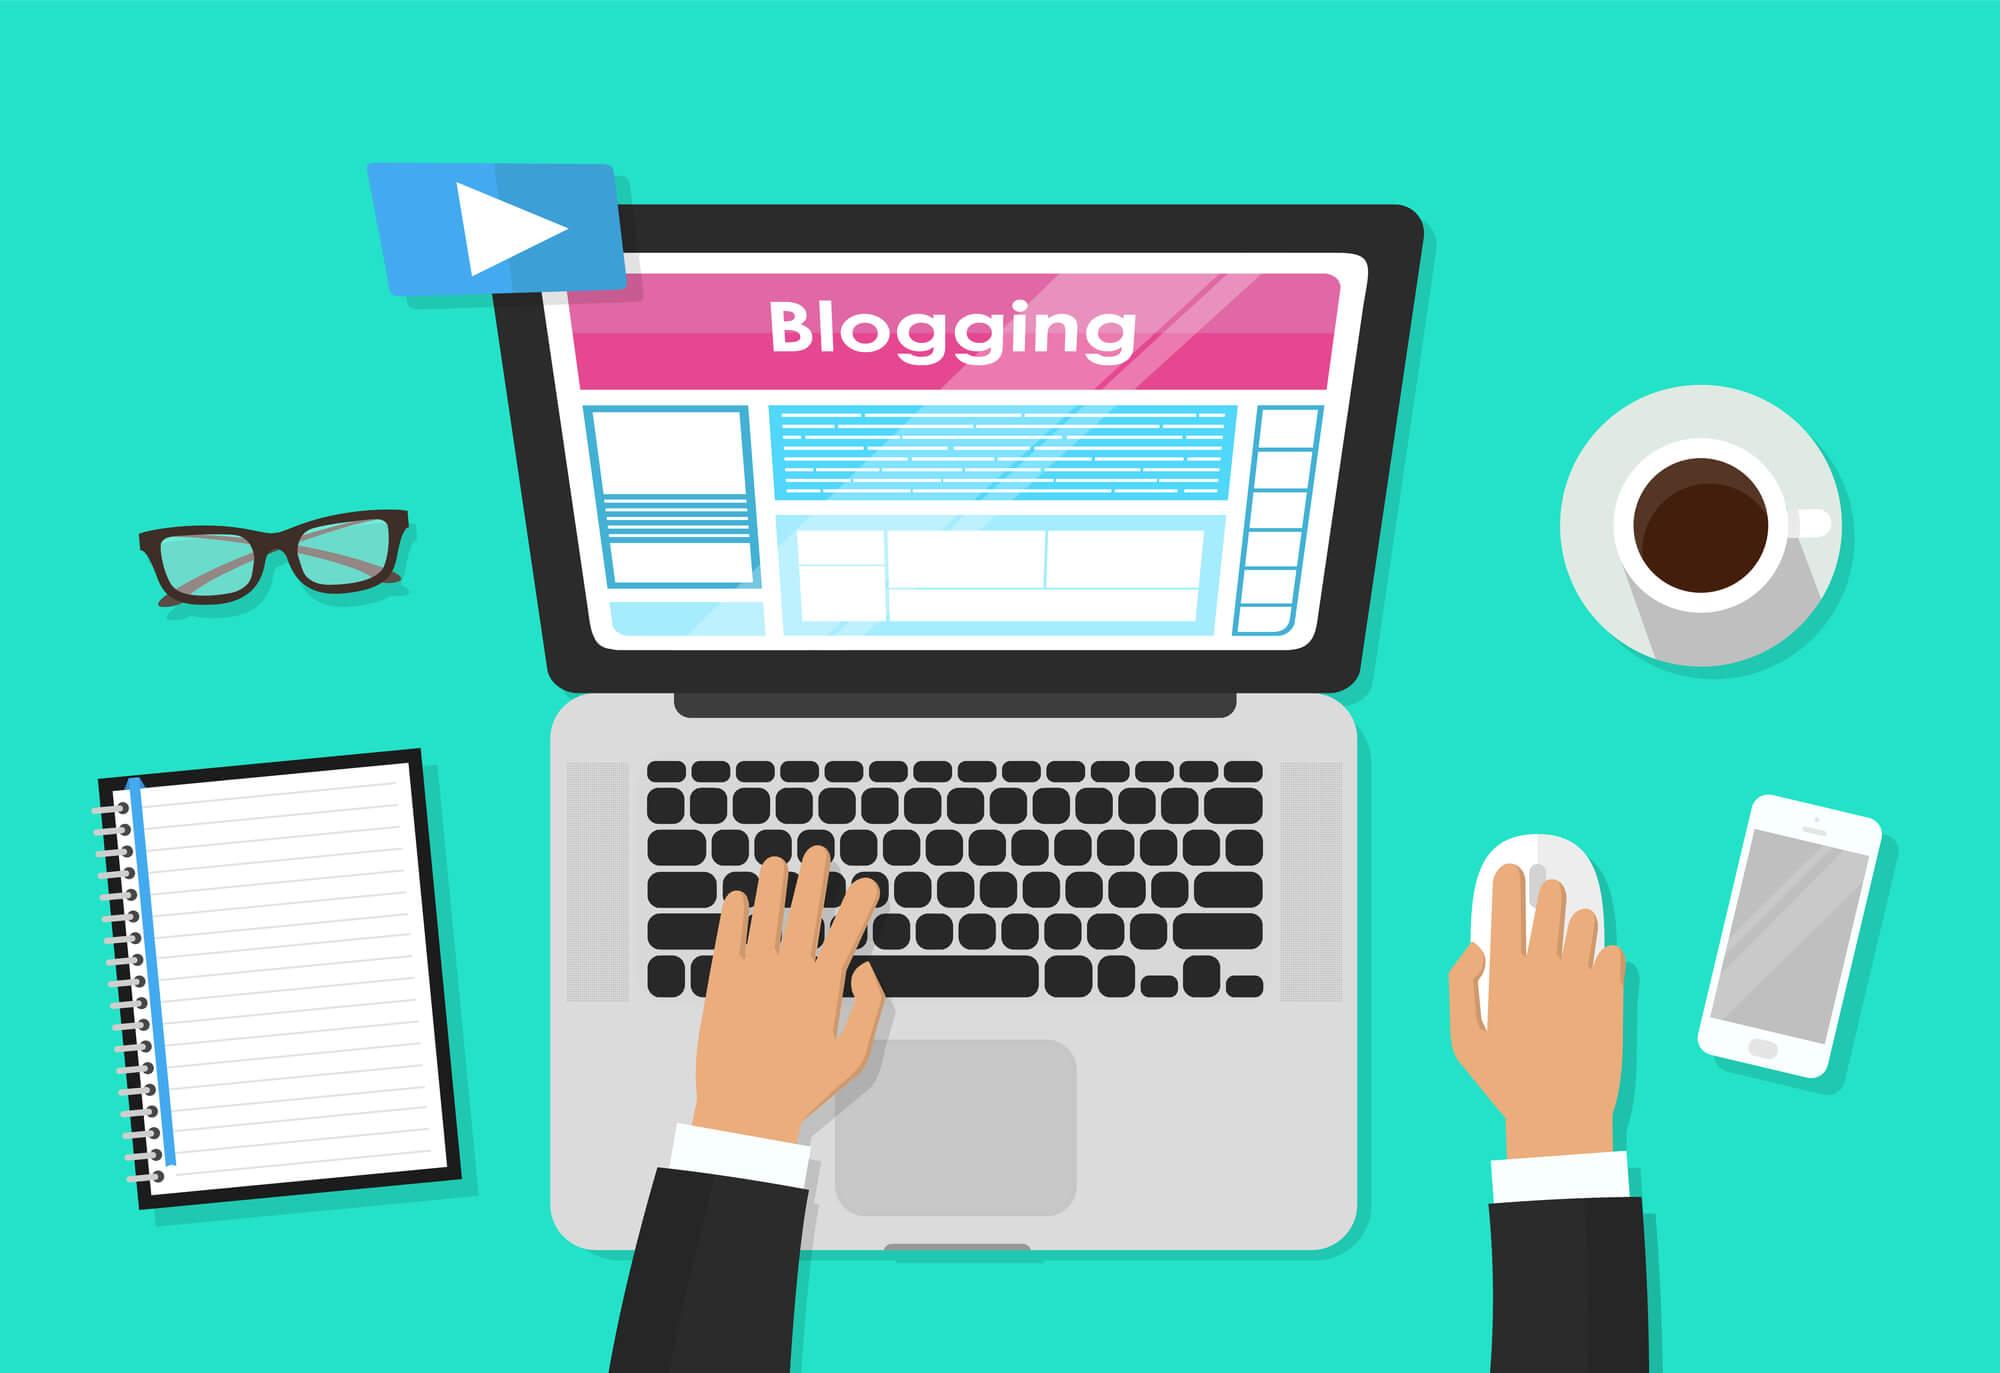 businessman-blogging-on-laptop